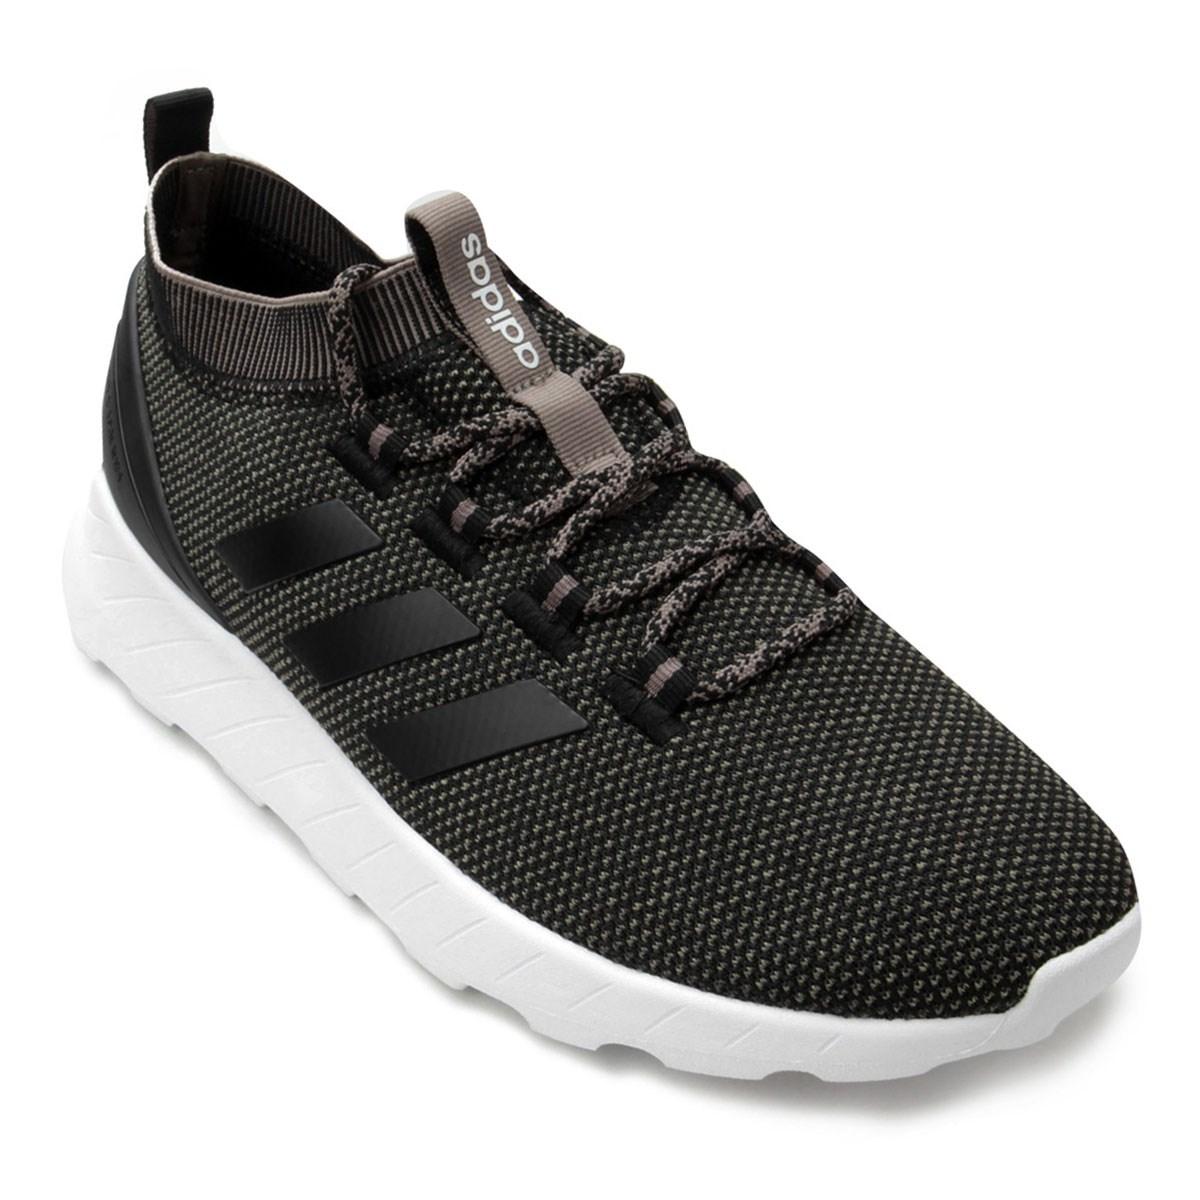 Tênis Adidas Questar Lifestyle Tr